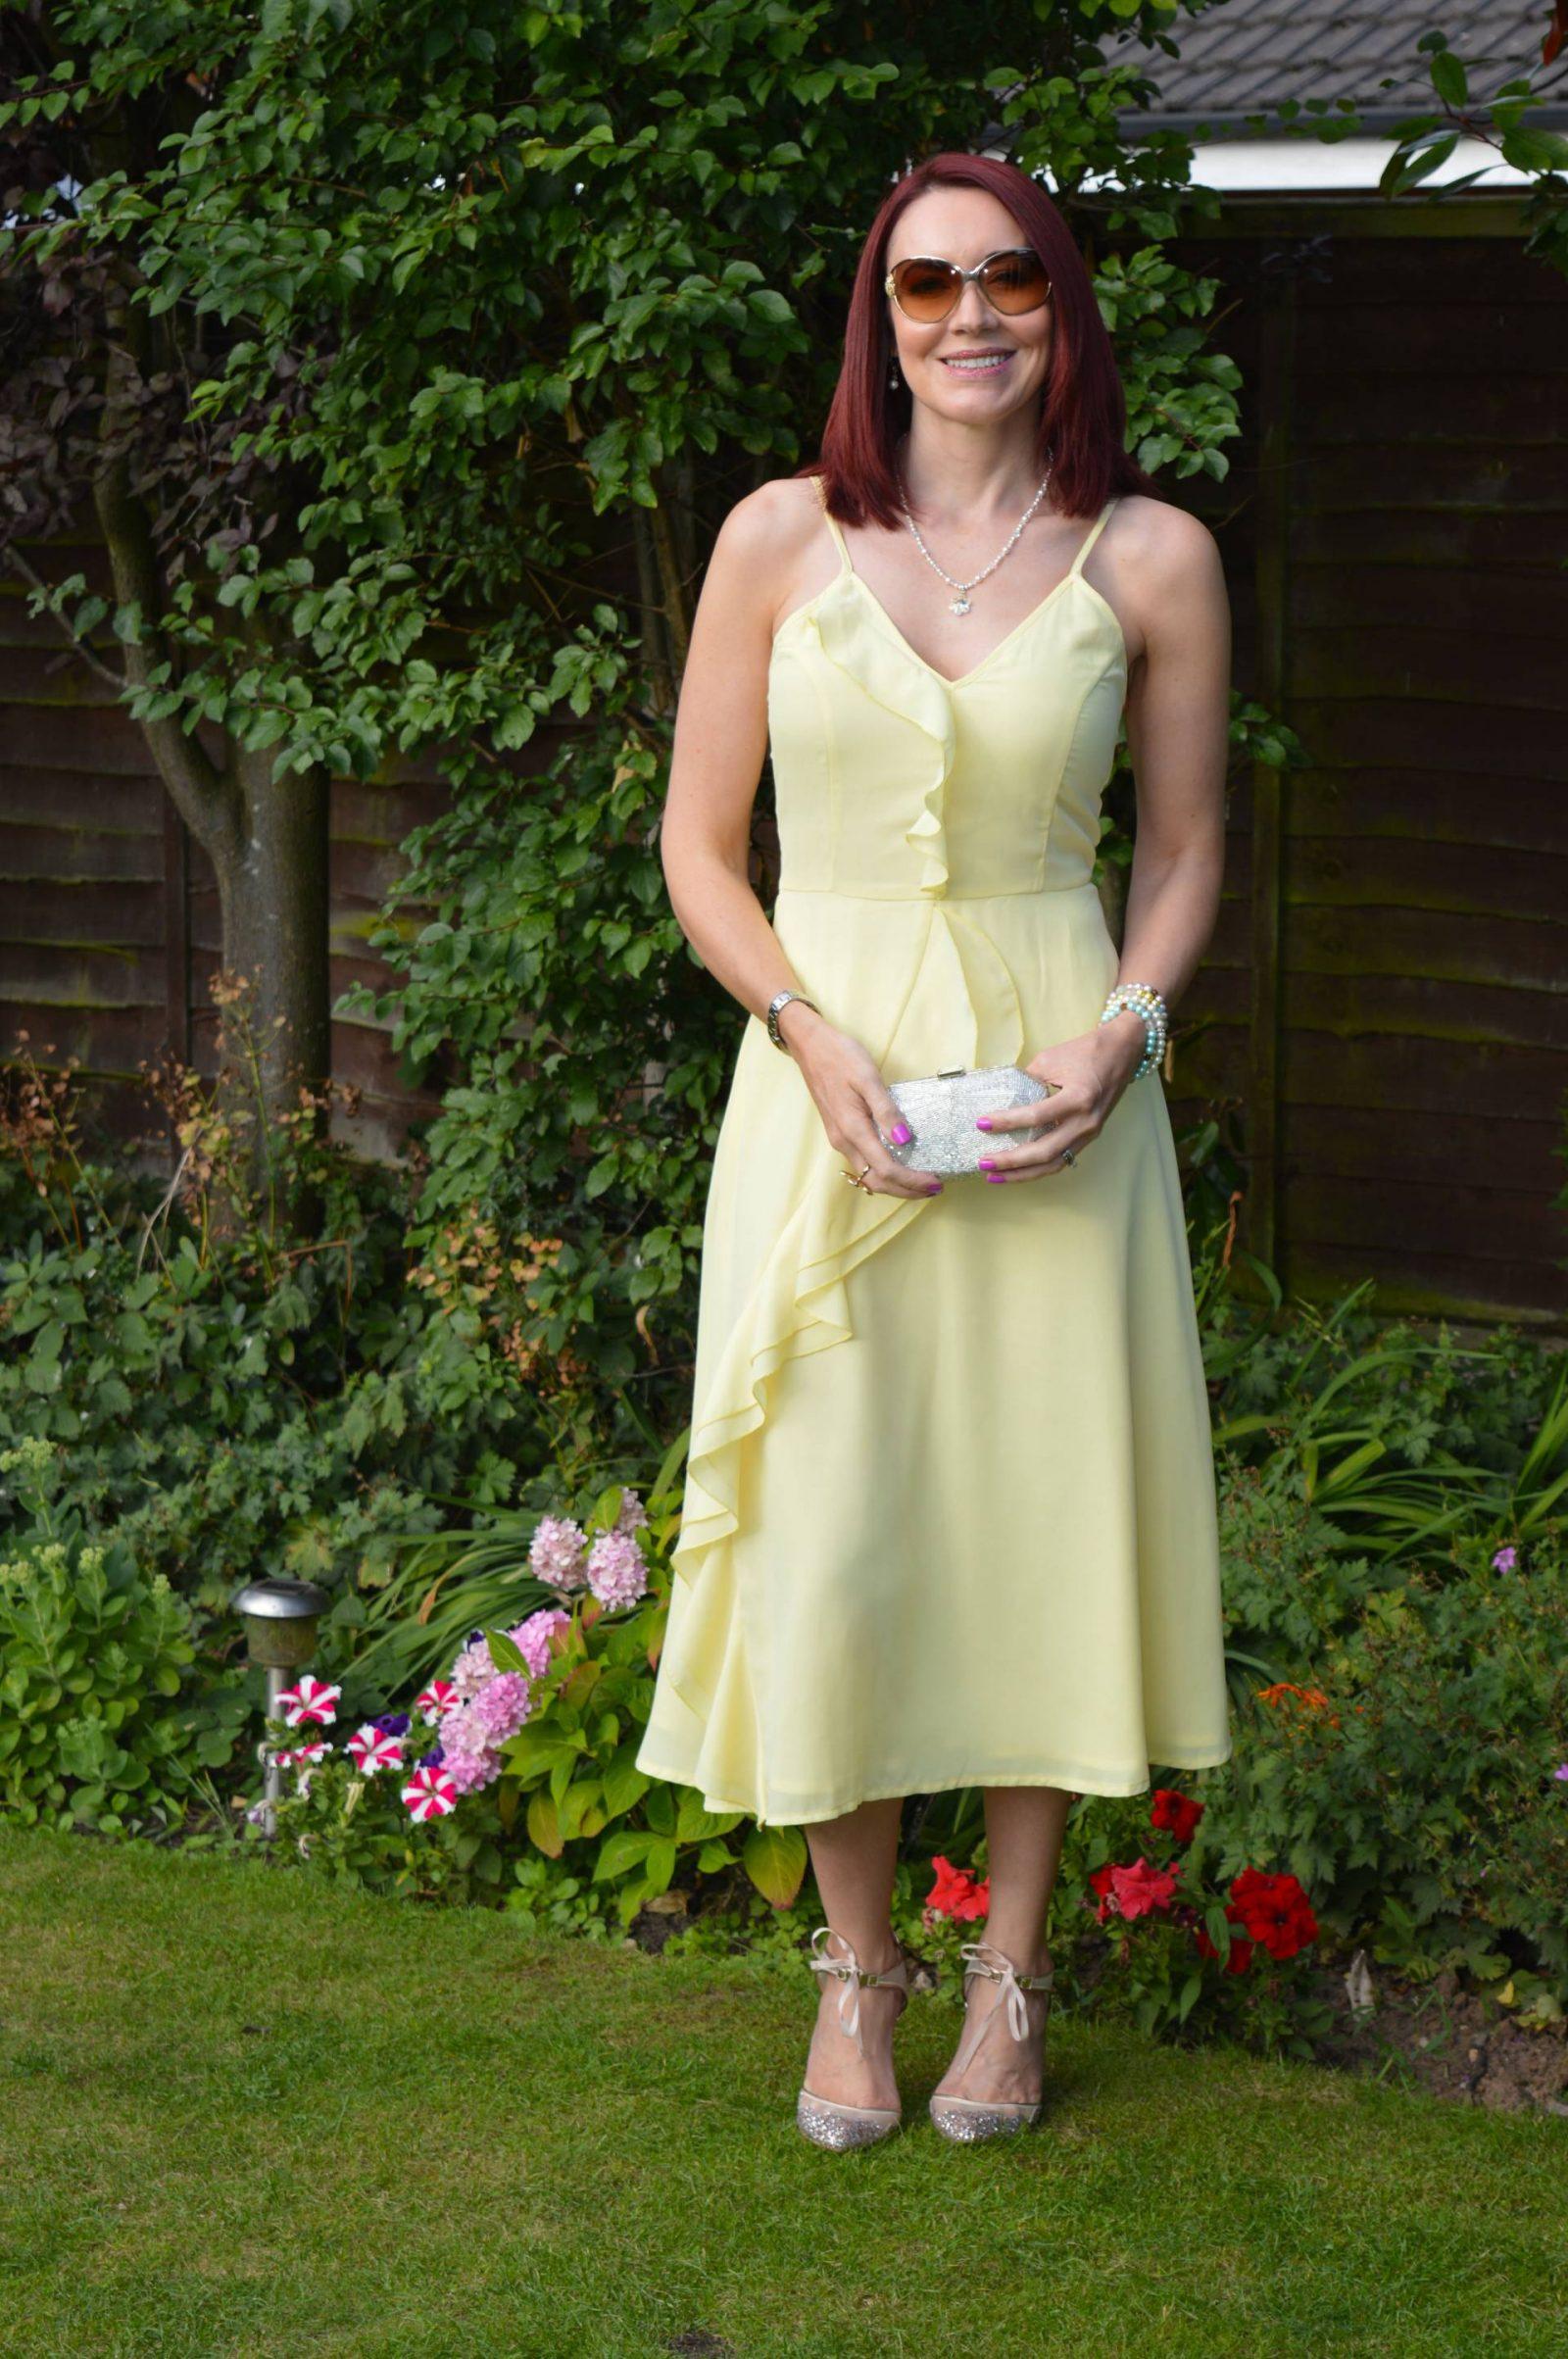 Wedding Guest Dresses From PrettyLittleThing Dallia lemon ruffle dress